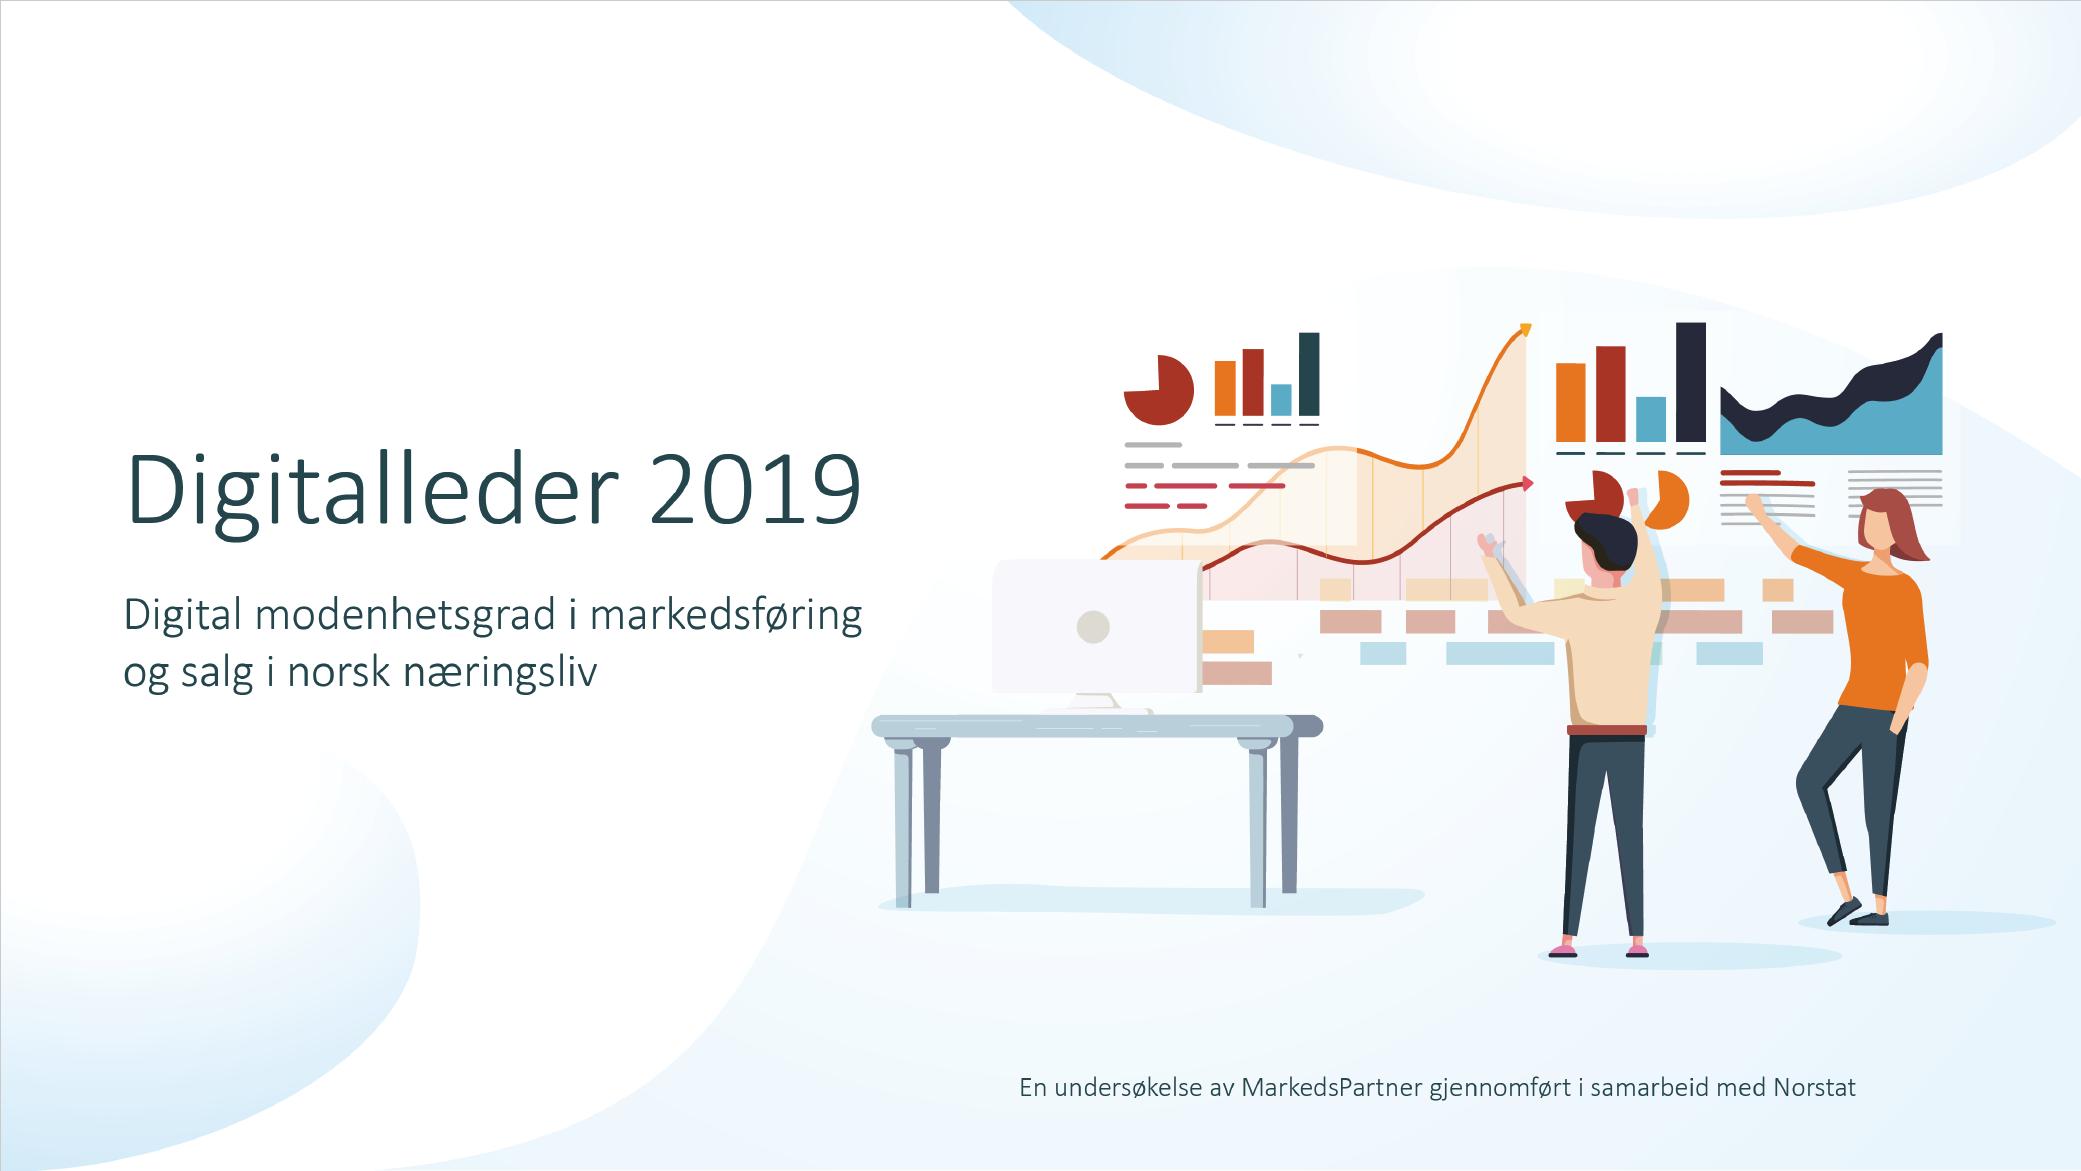 Digitalleder 2019 MarkedsPartner og Norstat